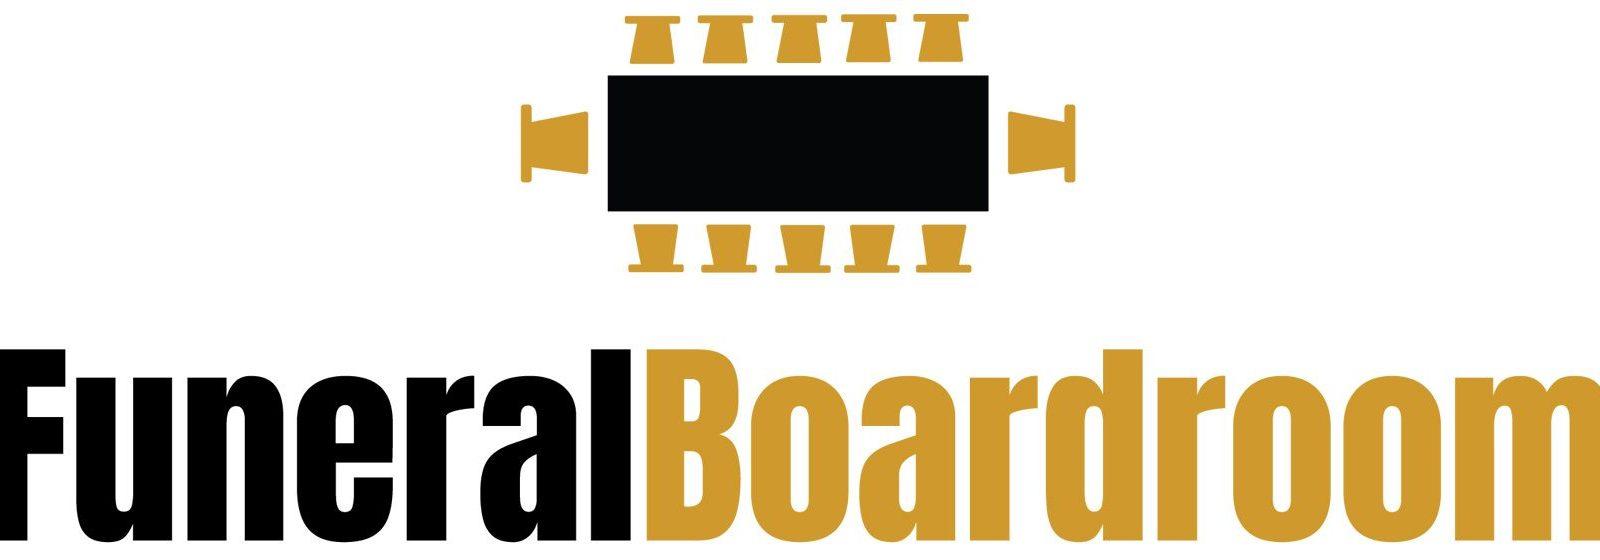 Funeral Boardroom